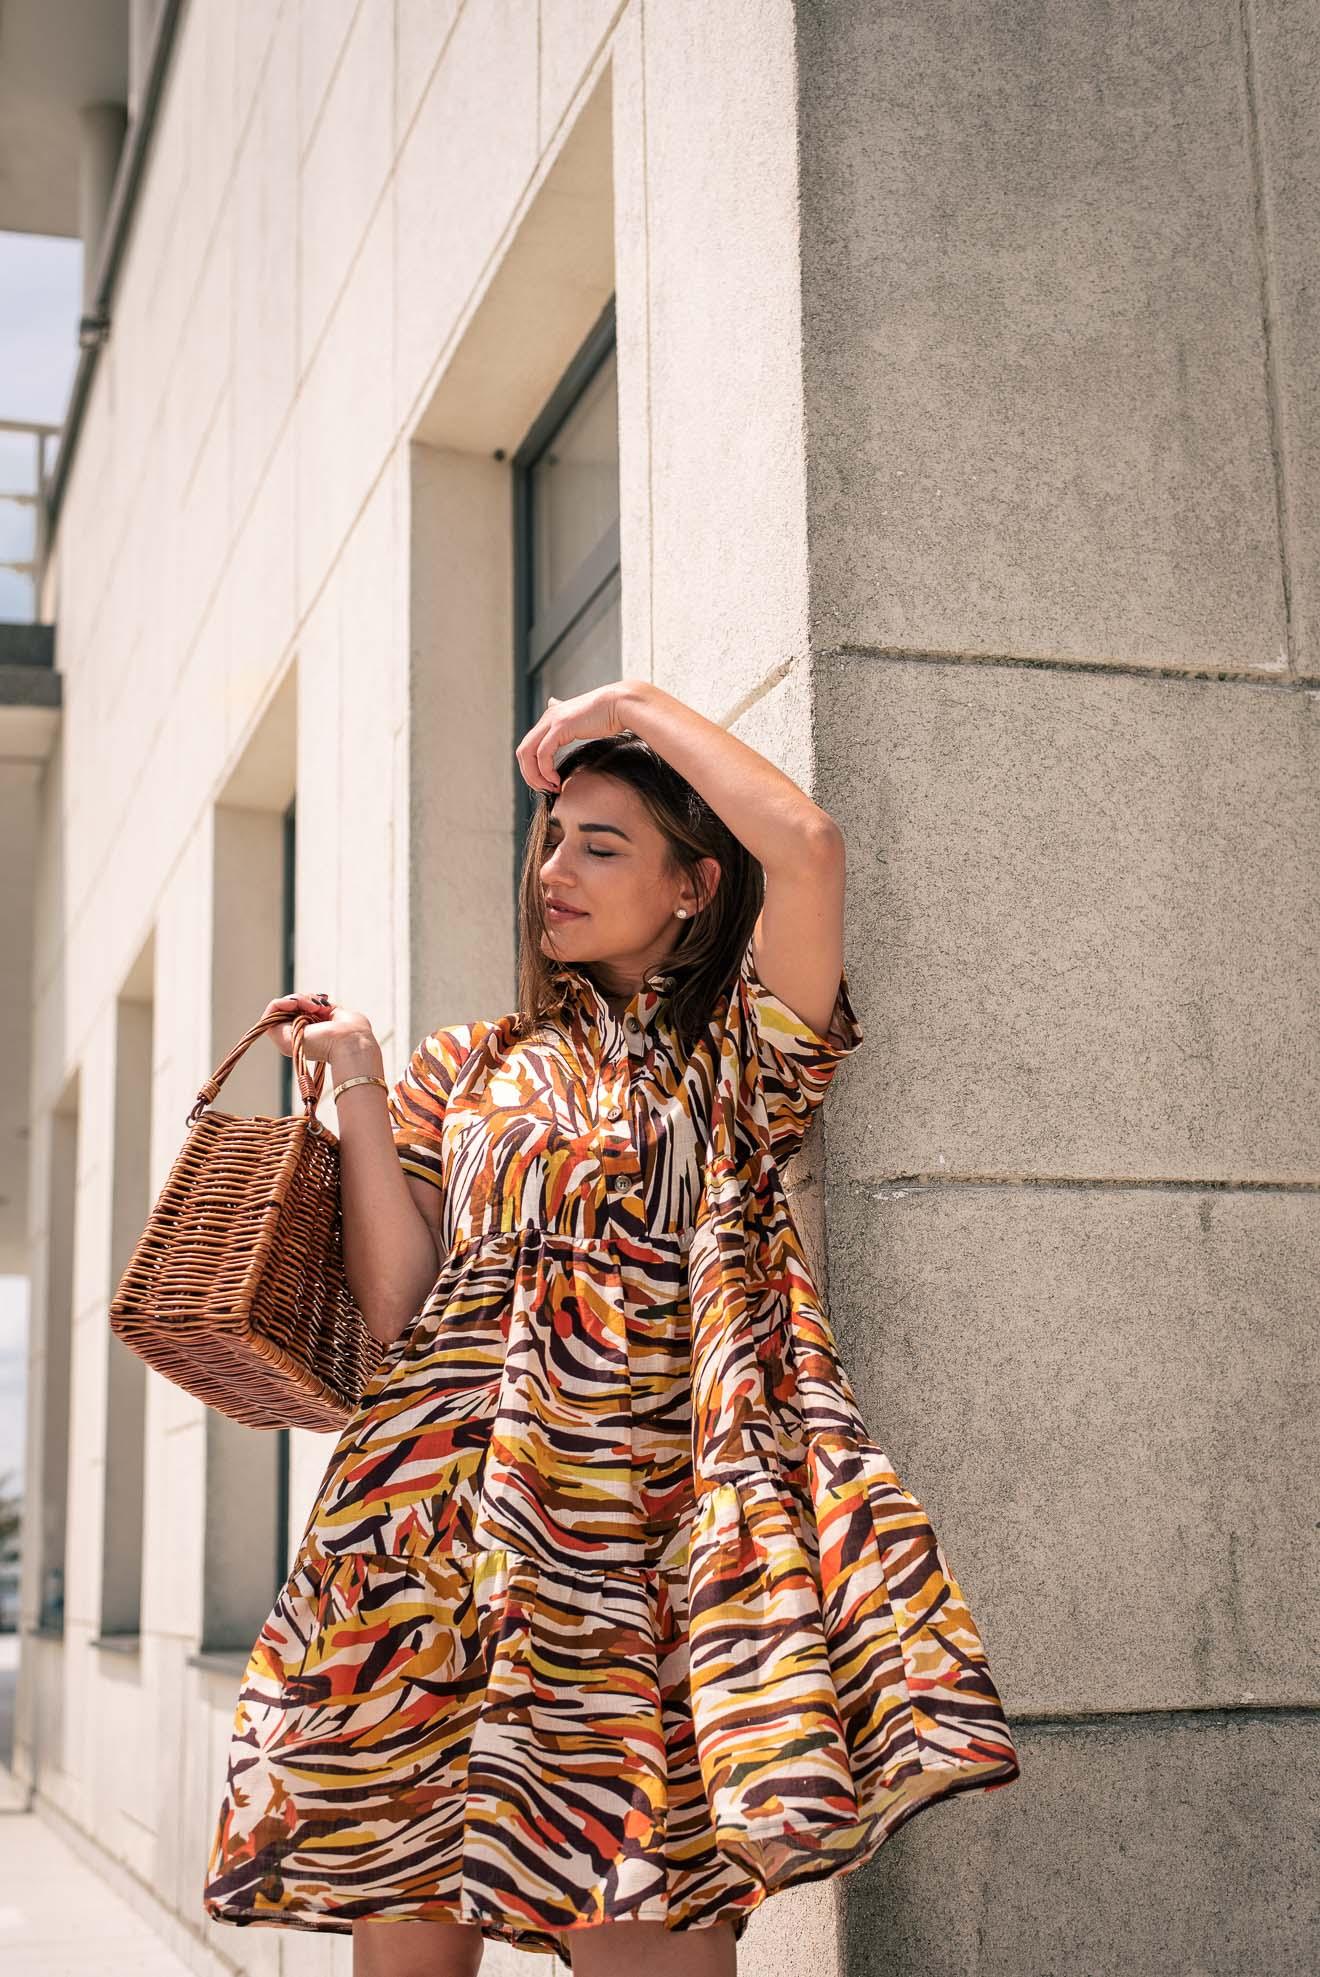 100% Linen dress by Denina Martin Collection